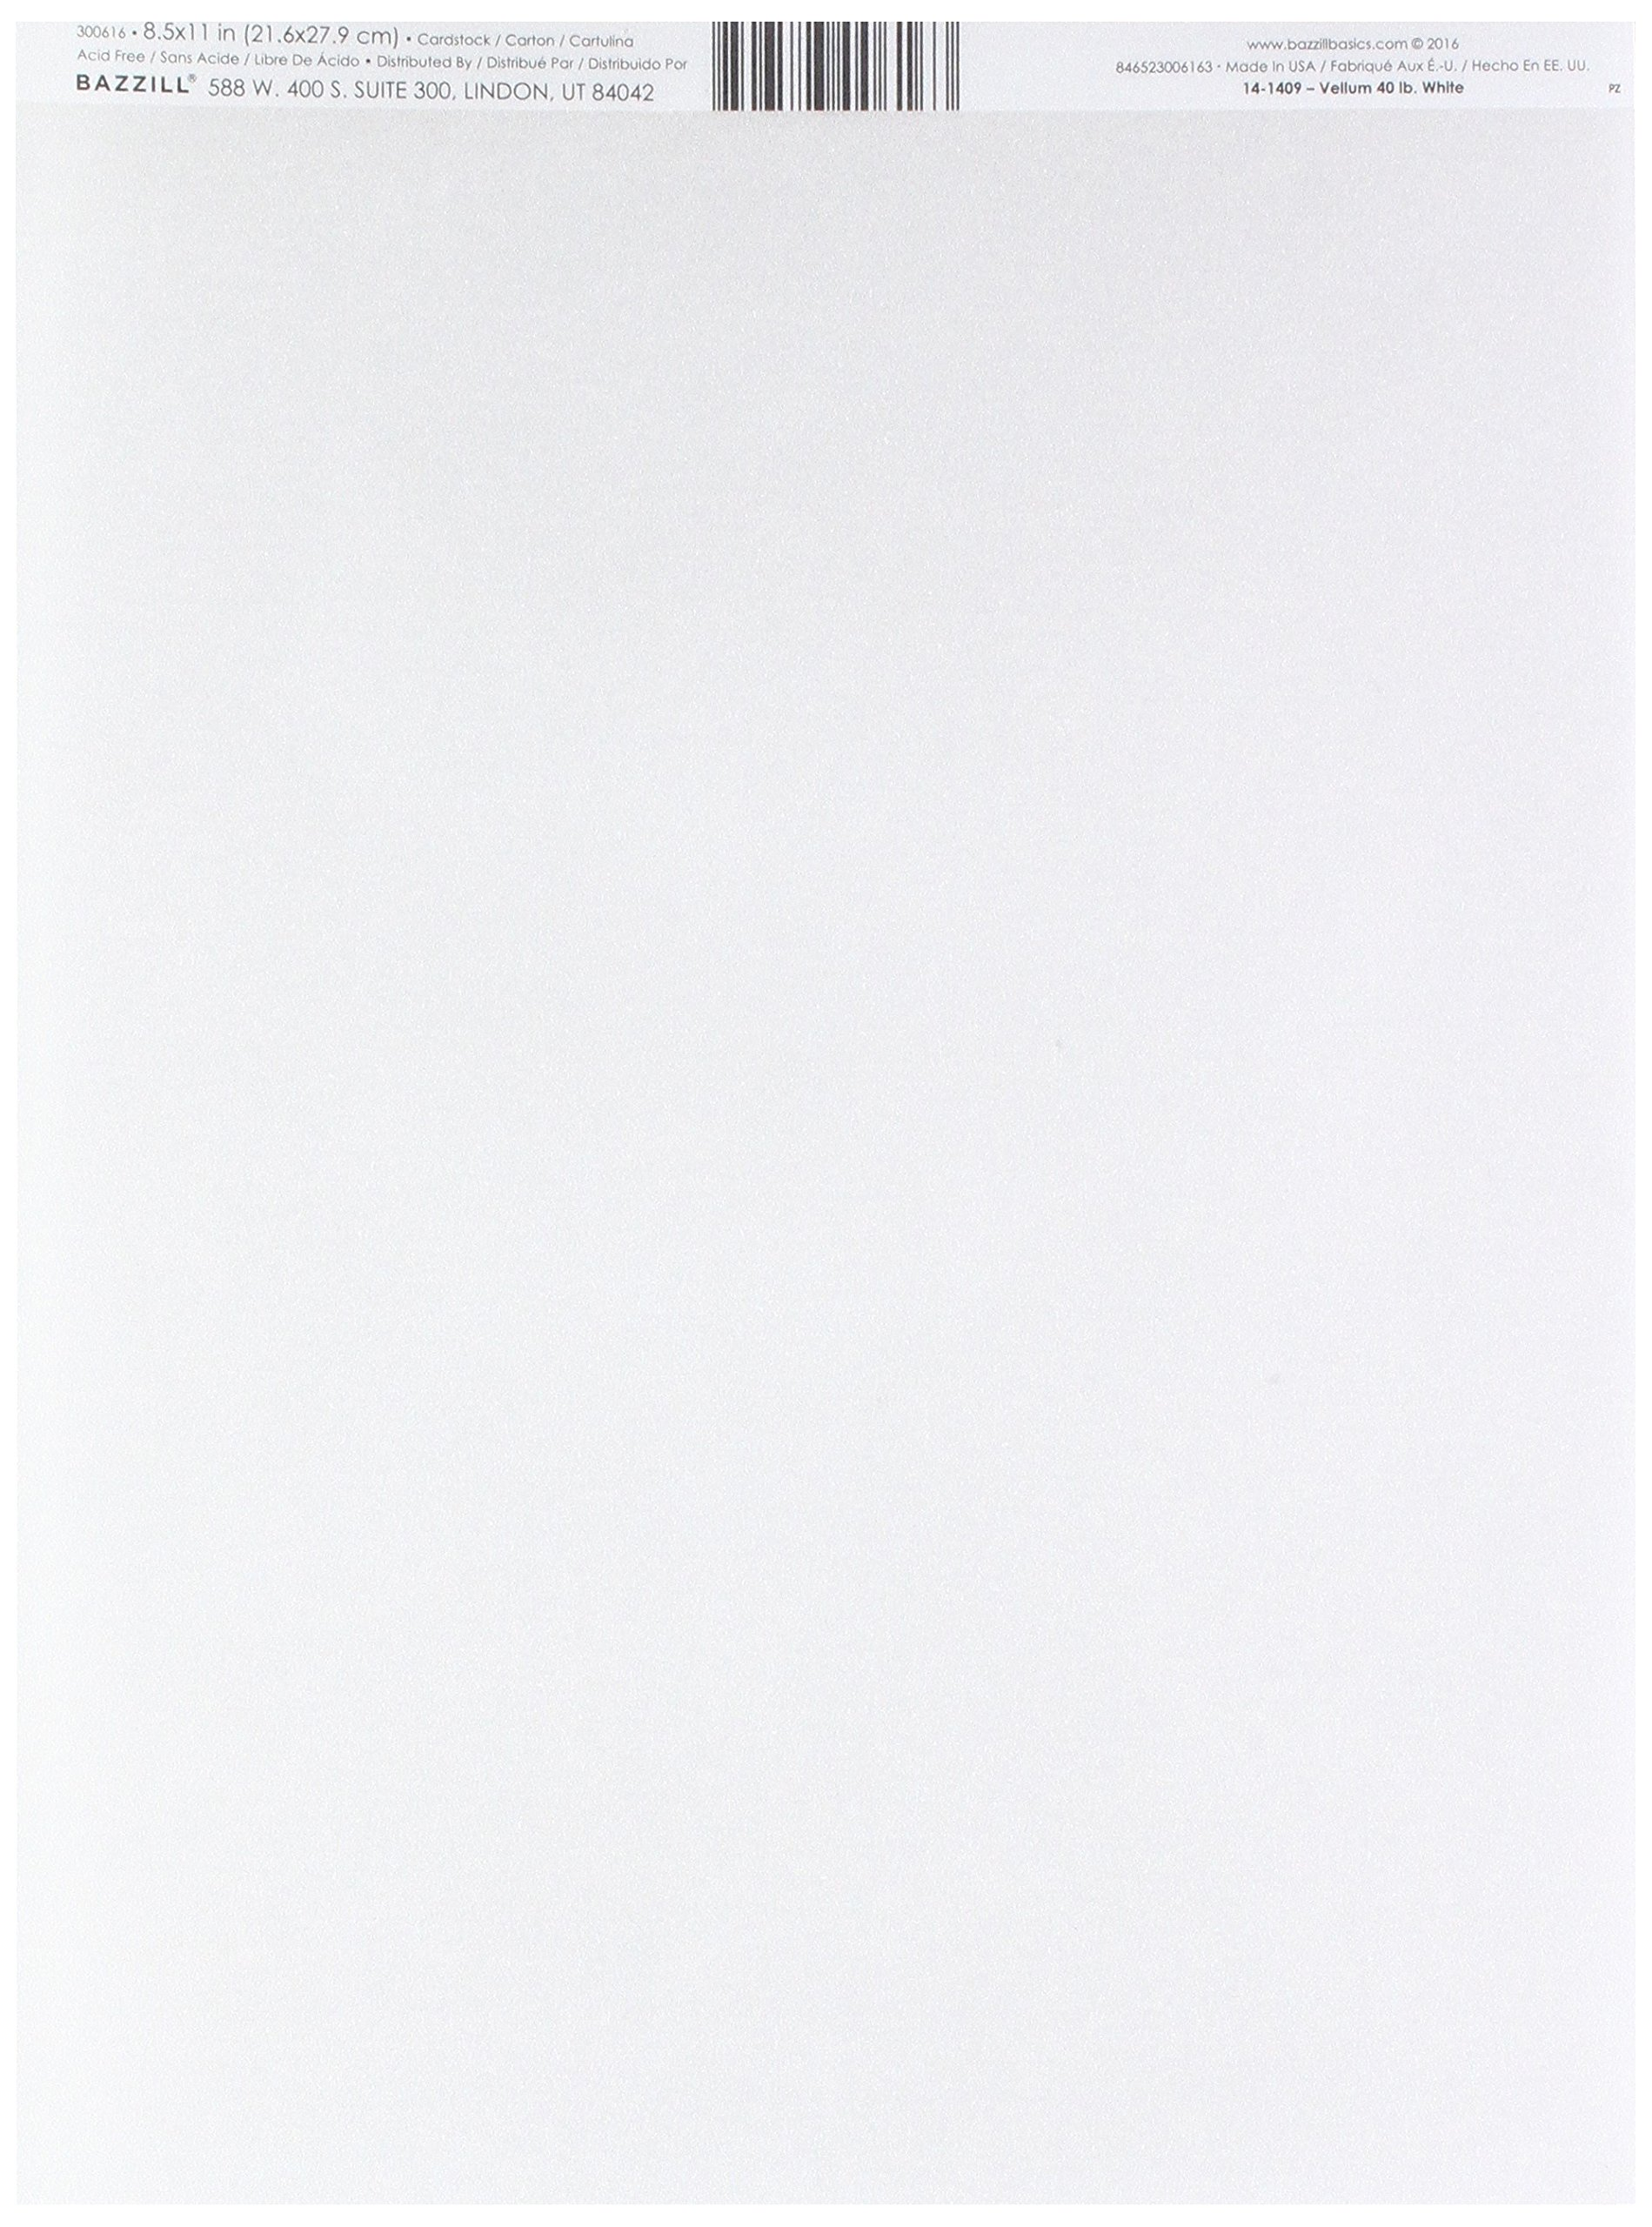 Bazzill Basics Paper 25 8.5 x 11 Inch White 40 lb Bazzill Basics Vellum Sheets Piece